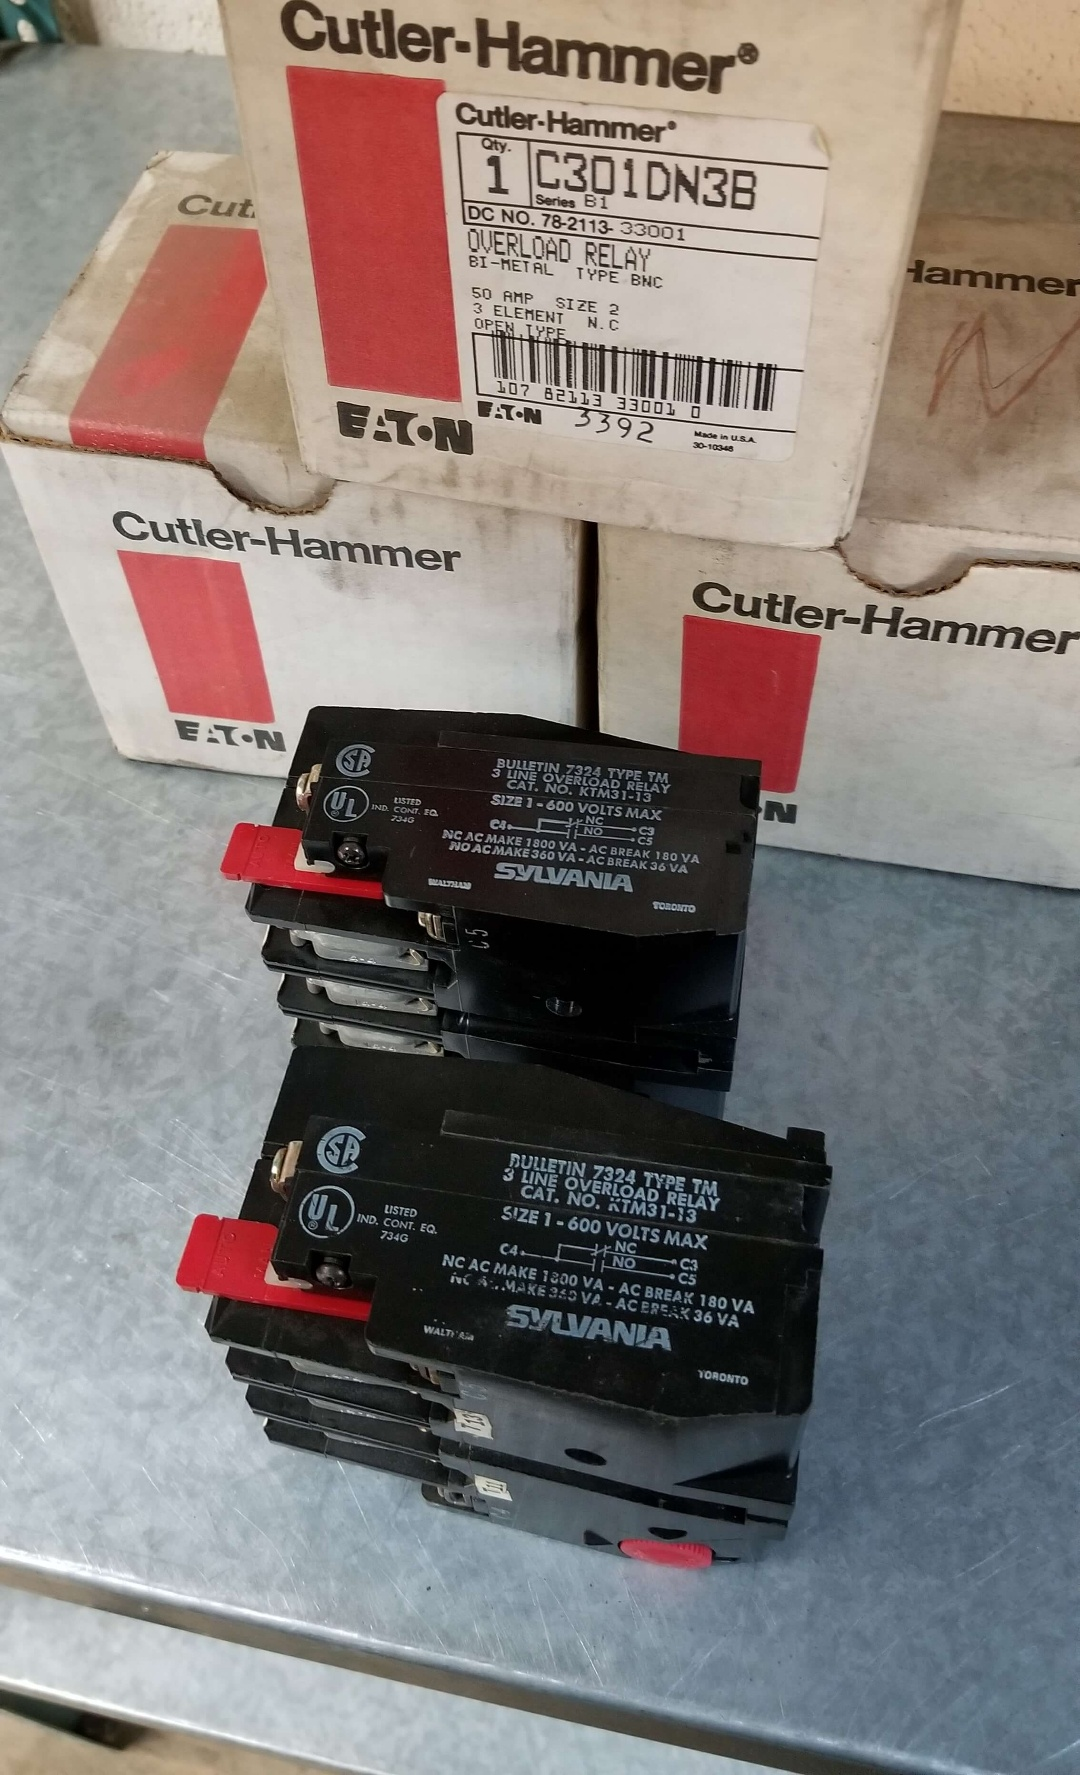 Cutler-Hammer Overload Relay P/N: C301DN3B $300.00